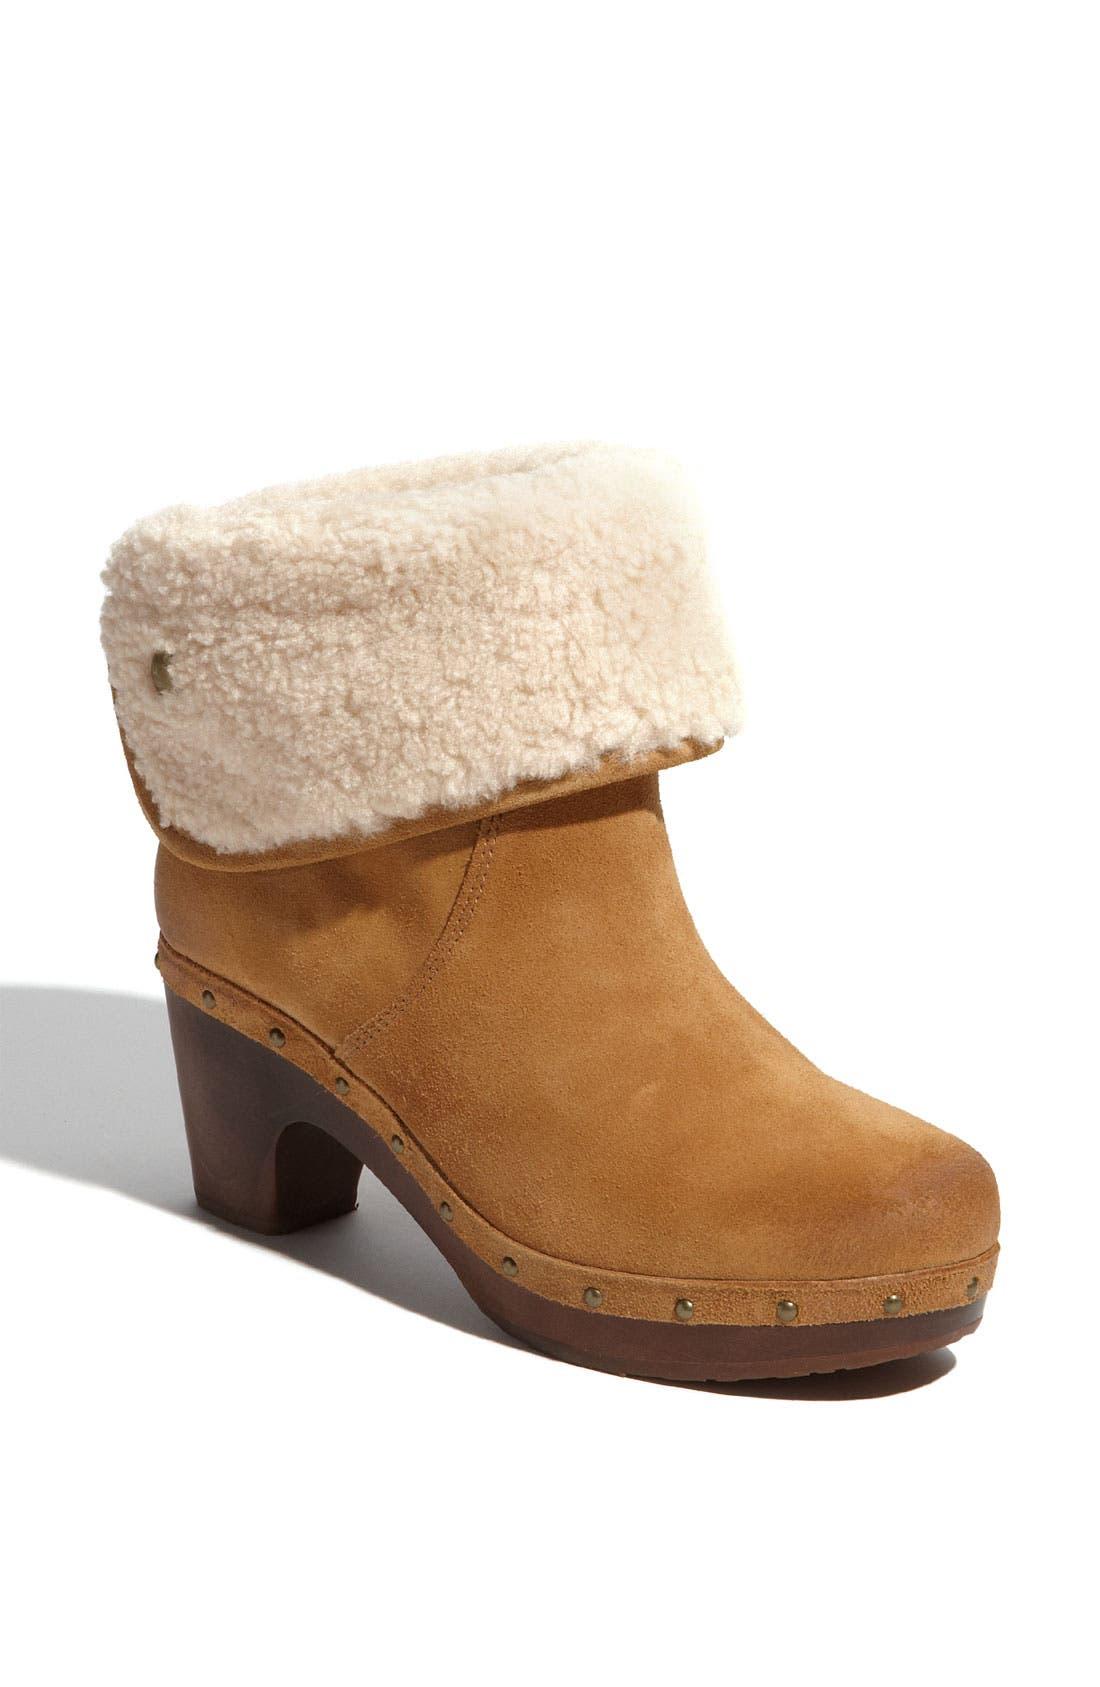 Main Image - UGG® Australia 'Lynnea' Ankle Boot